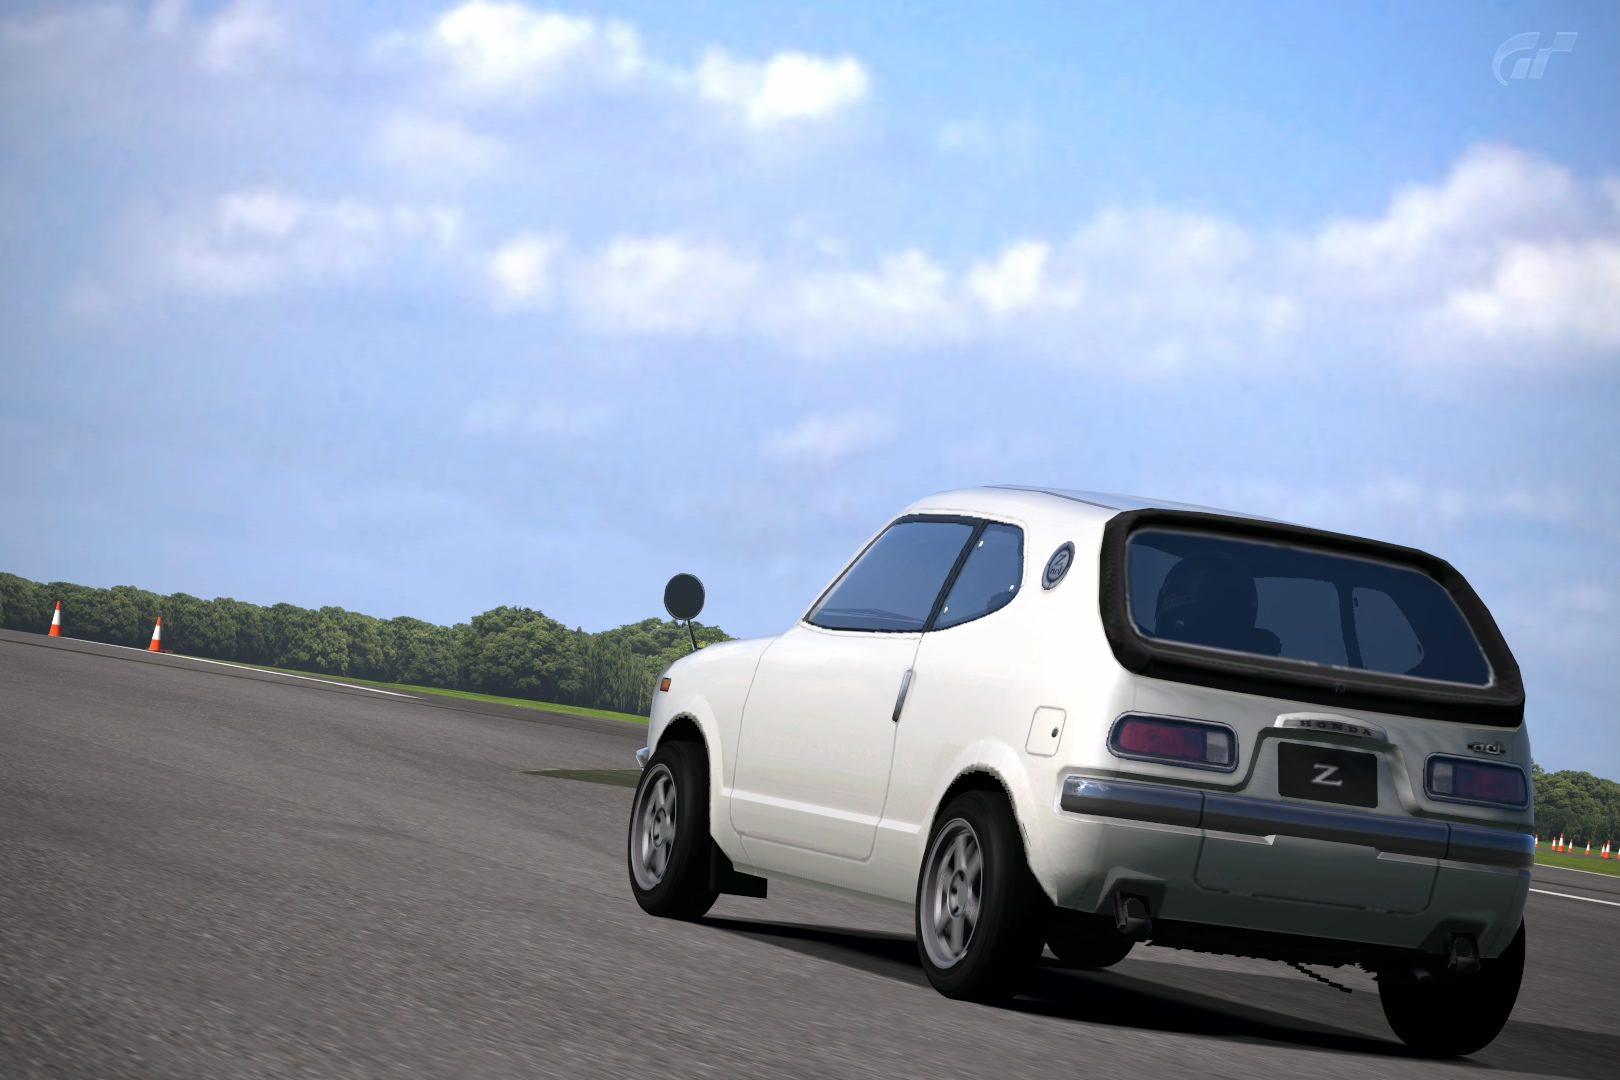 The Top Gear Test Track_4.jpg